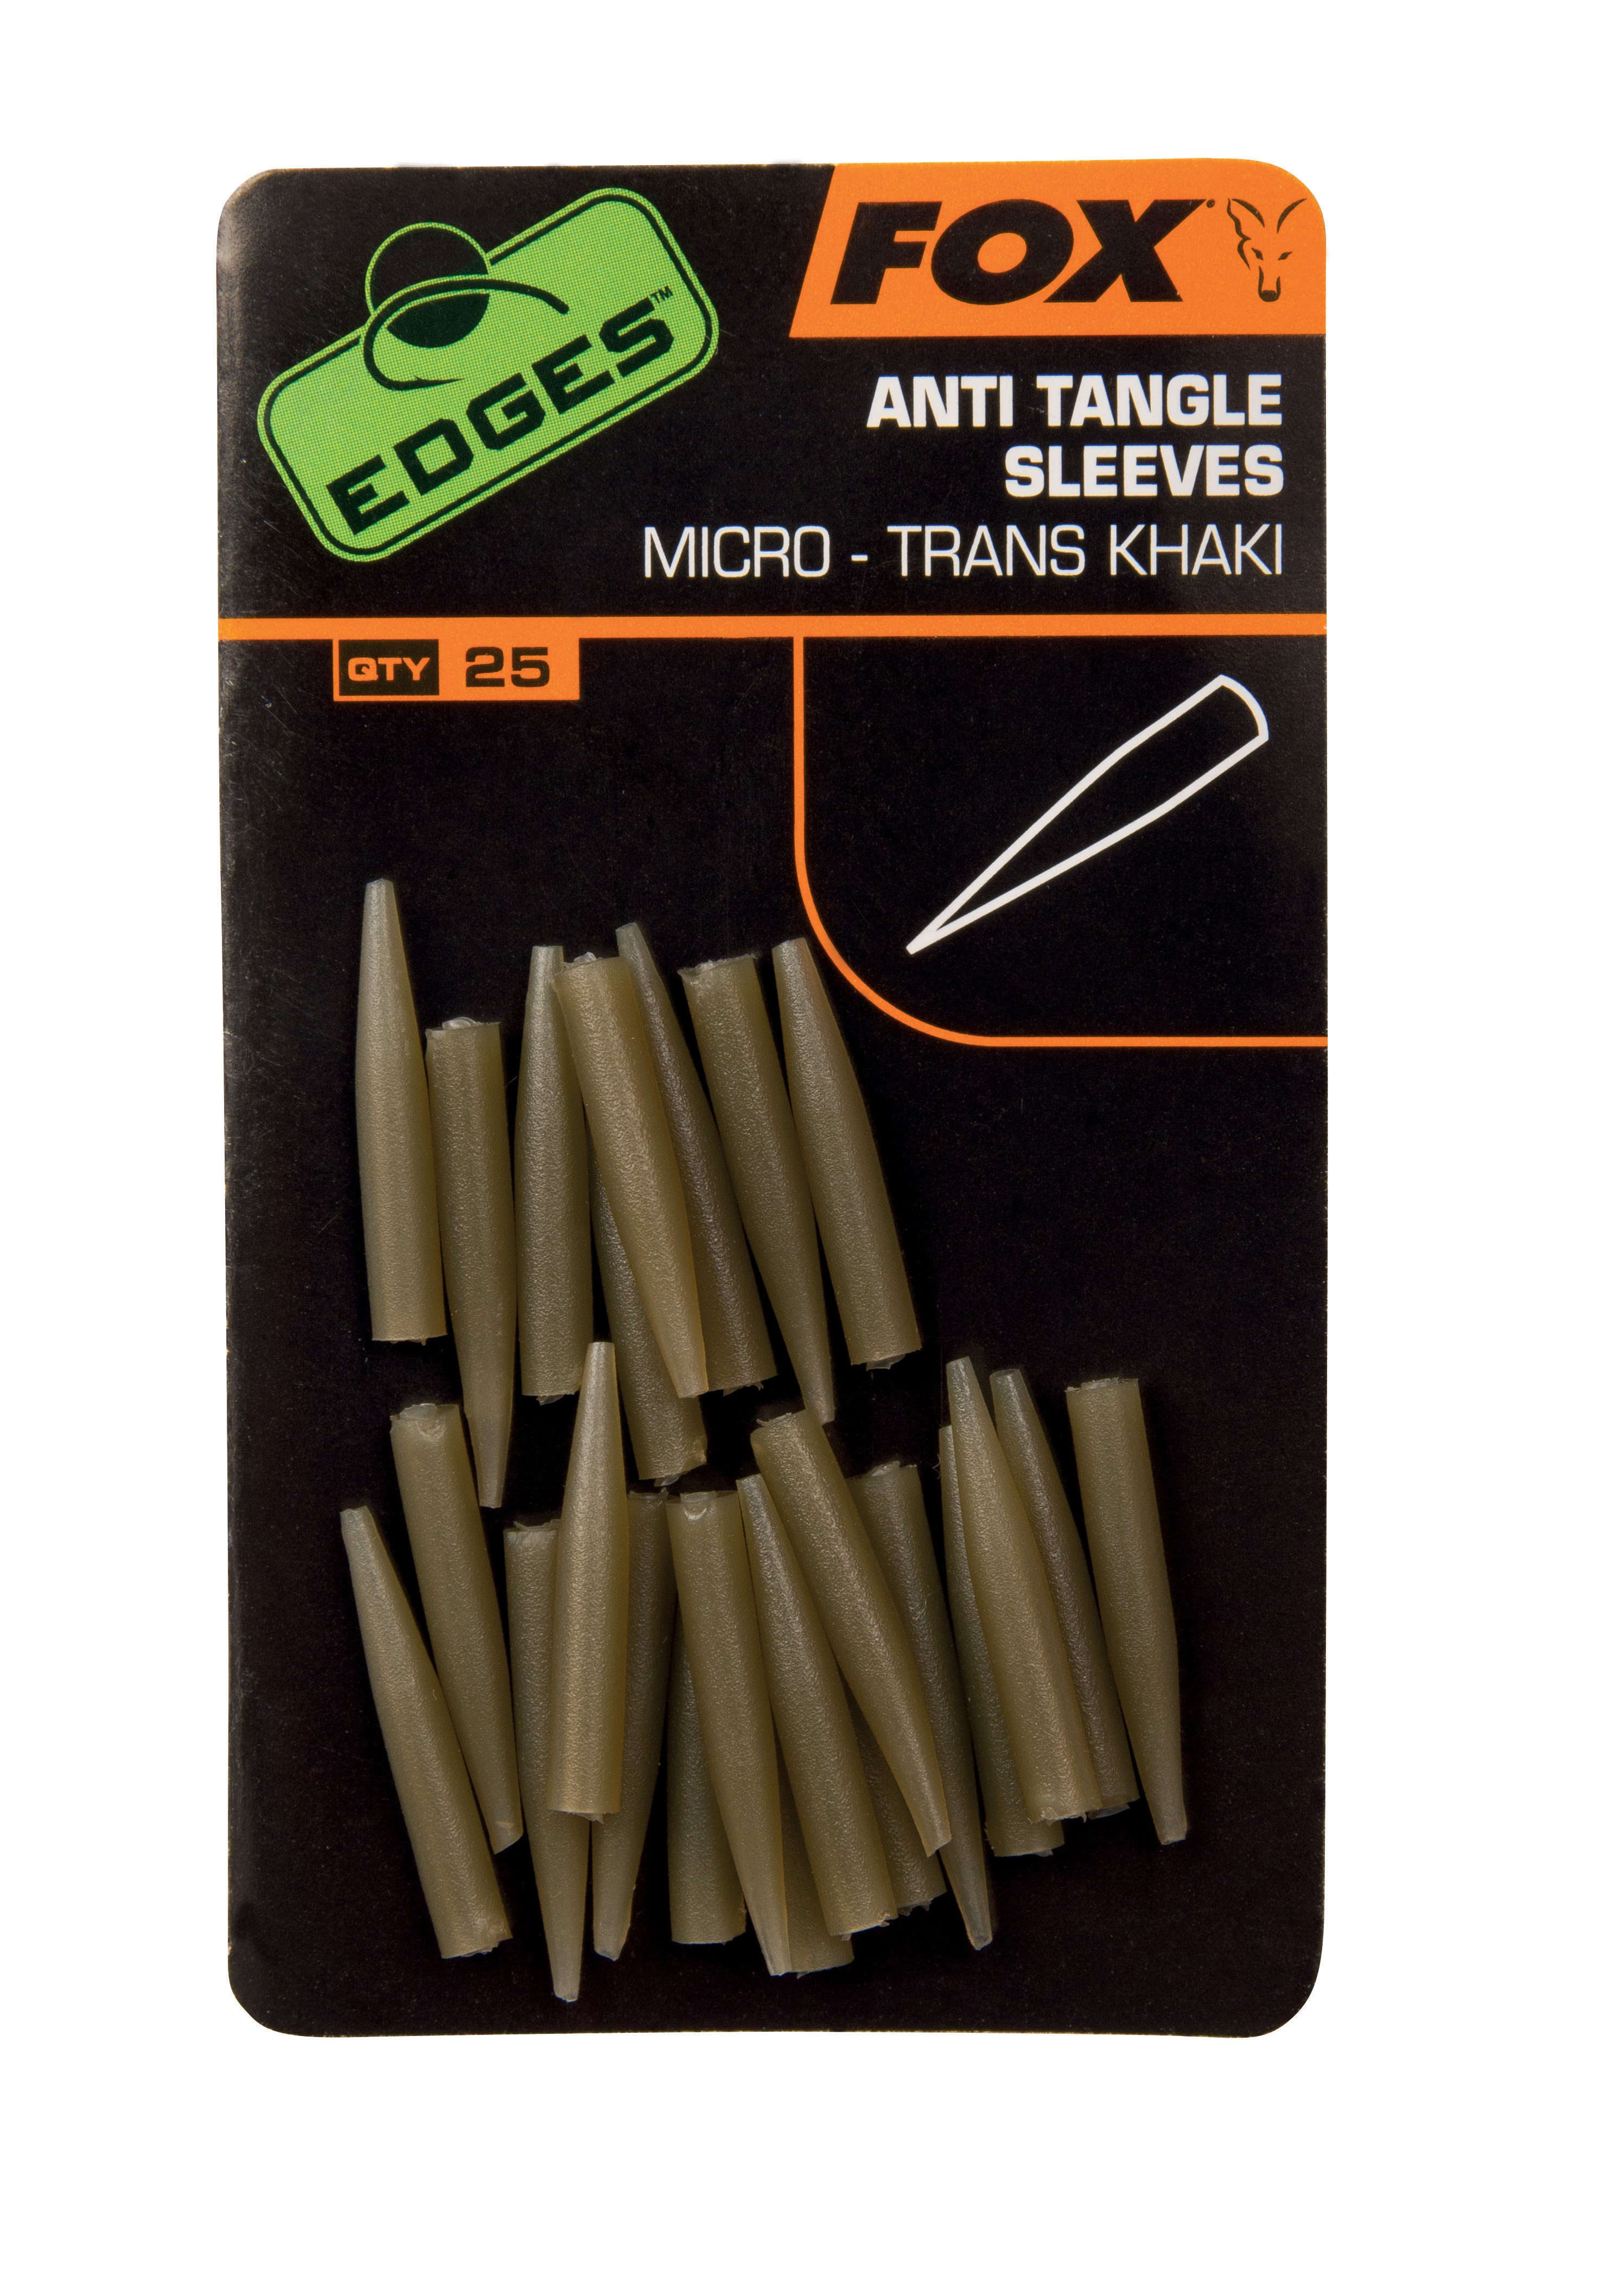 Fox Anti Tangle Sleeves micro